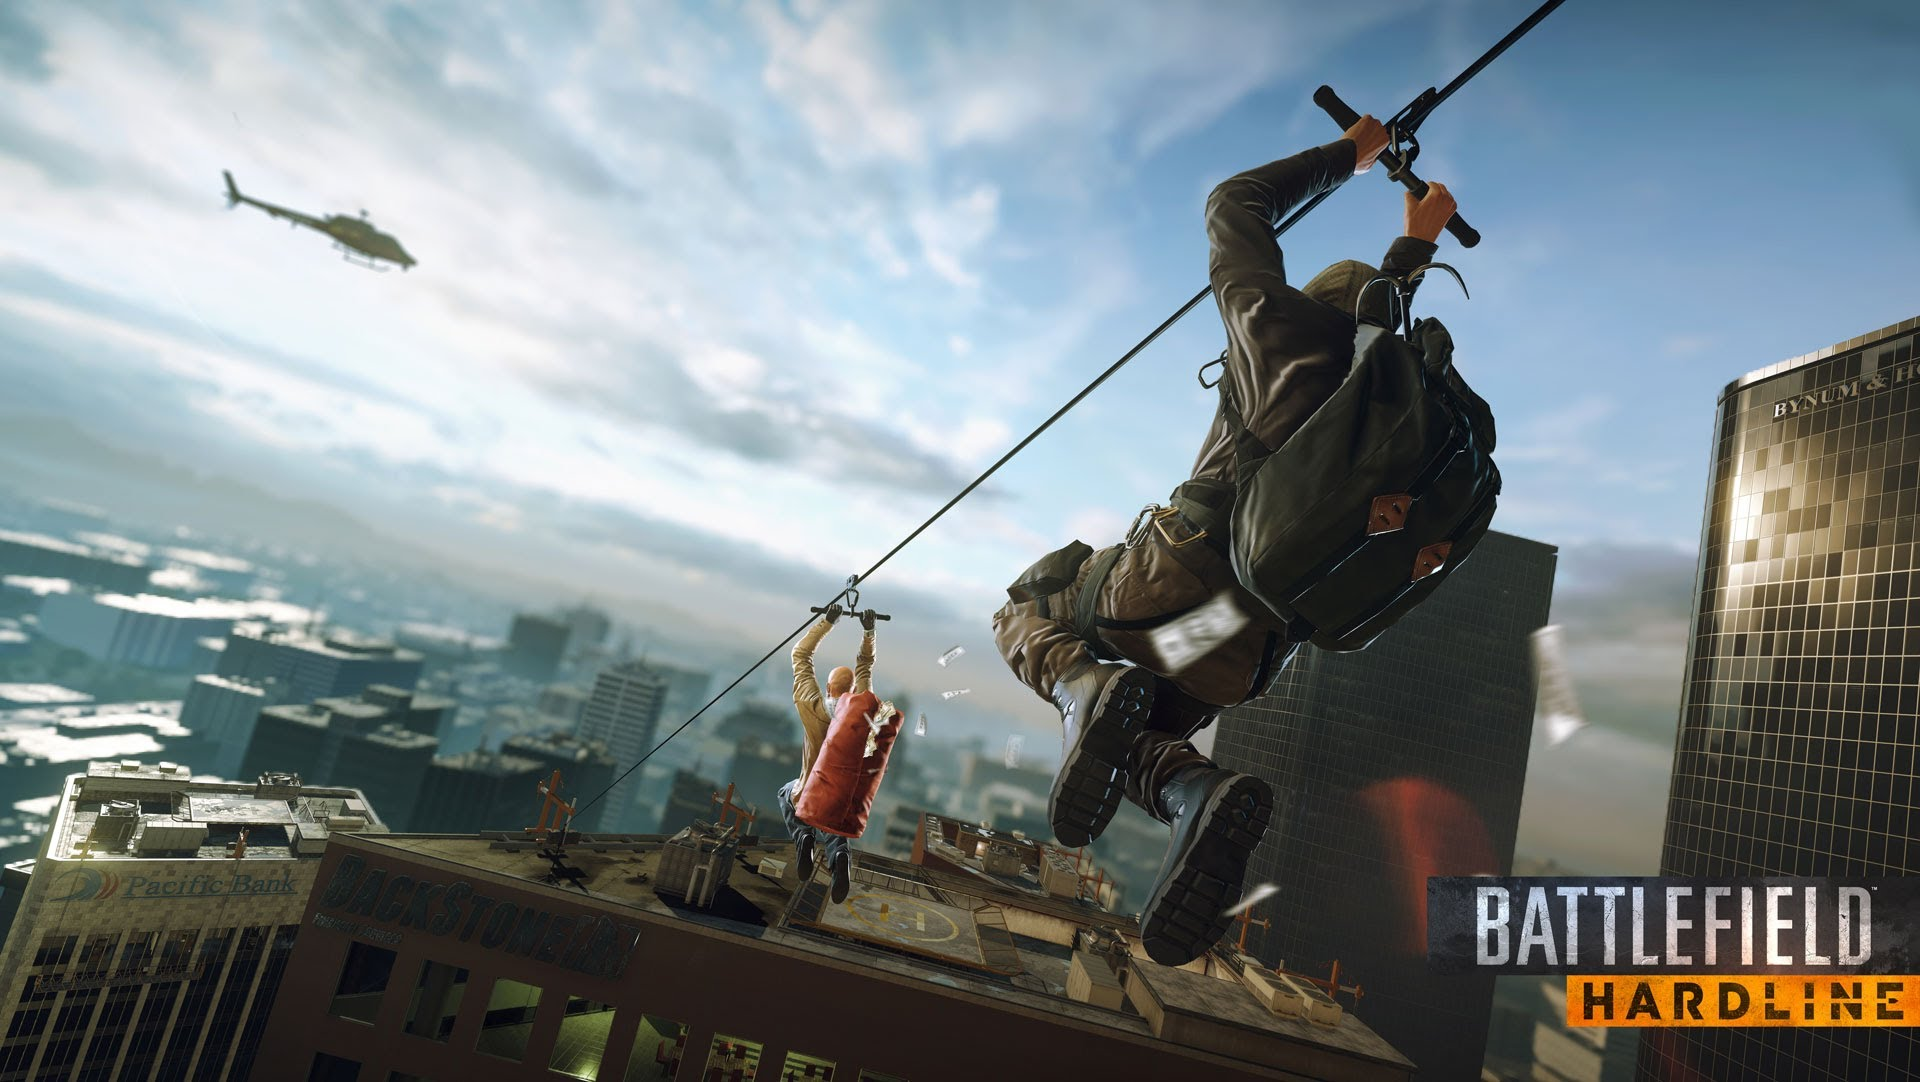 Battlefield Hardline Tweaks, Crashes, Error fixes, FPS, Performance, Lag and Fixes